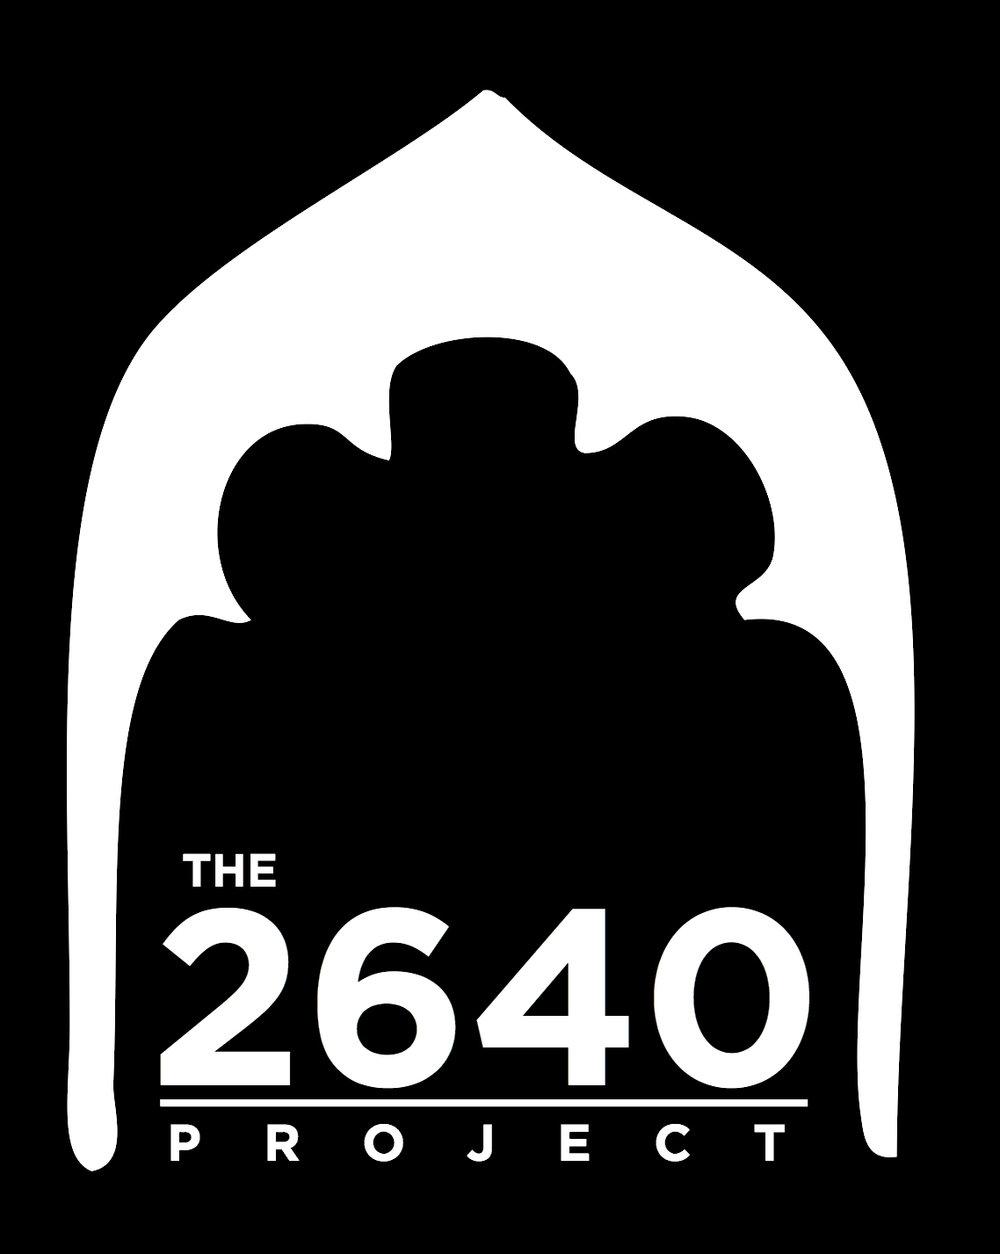 space 2460 logo.jpg